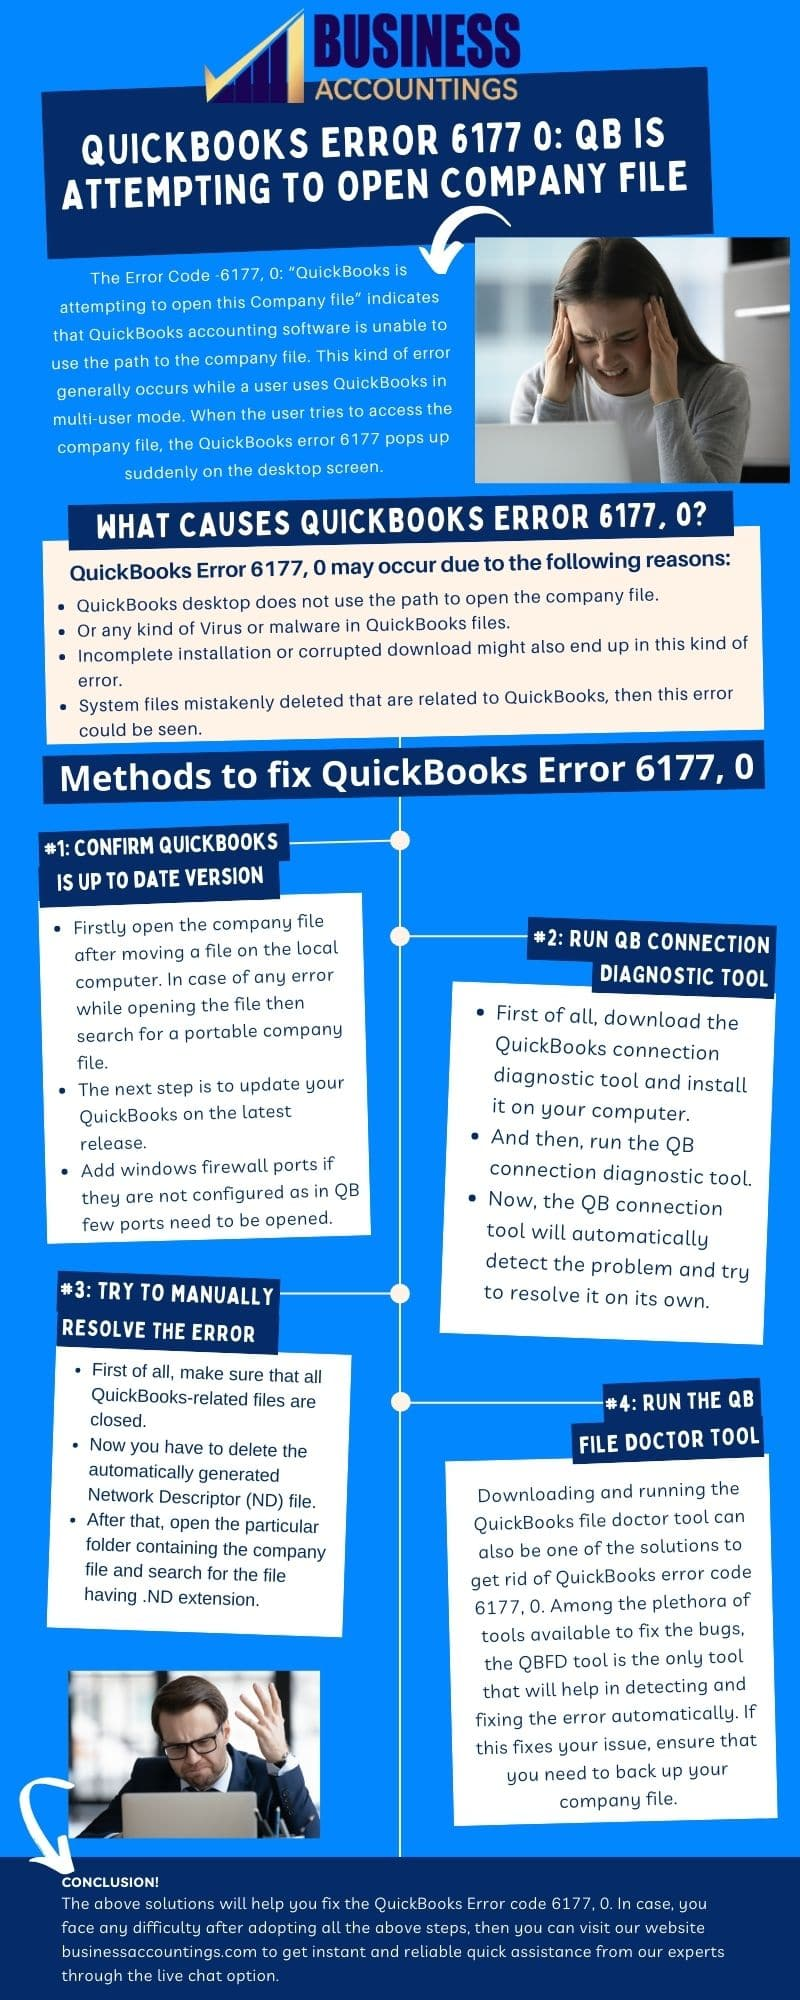 Infographics of Solutions for Quickbooks Error Code 6177